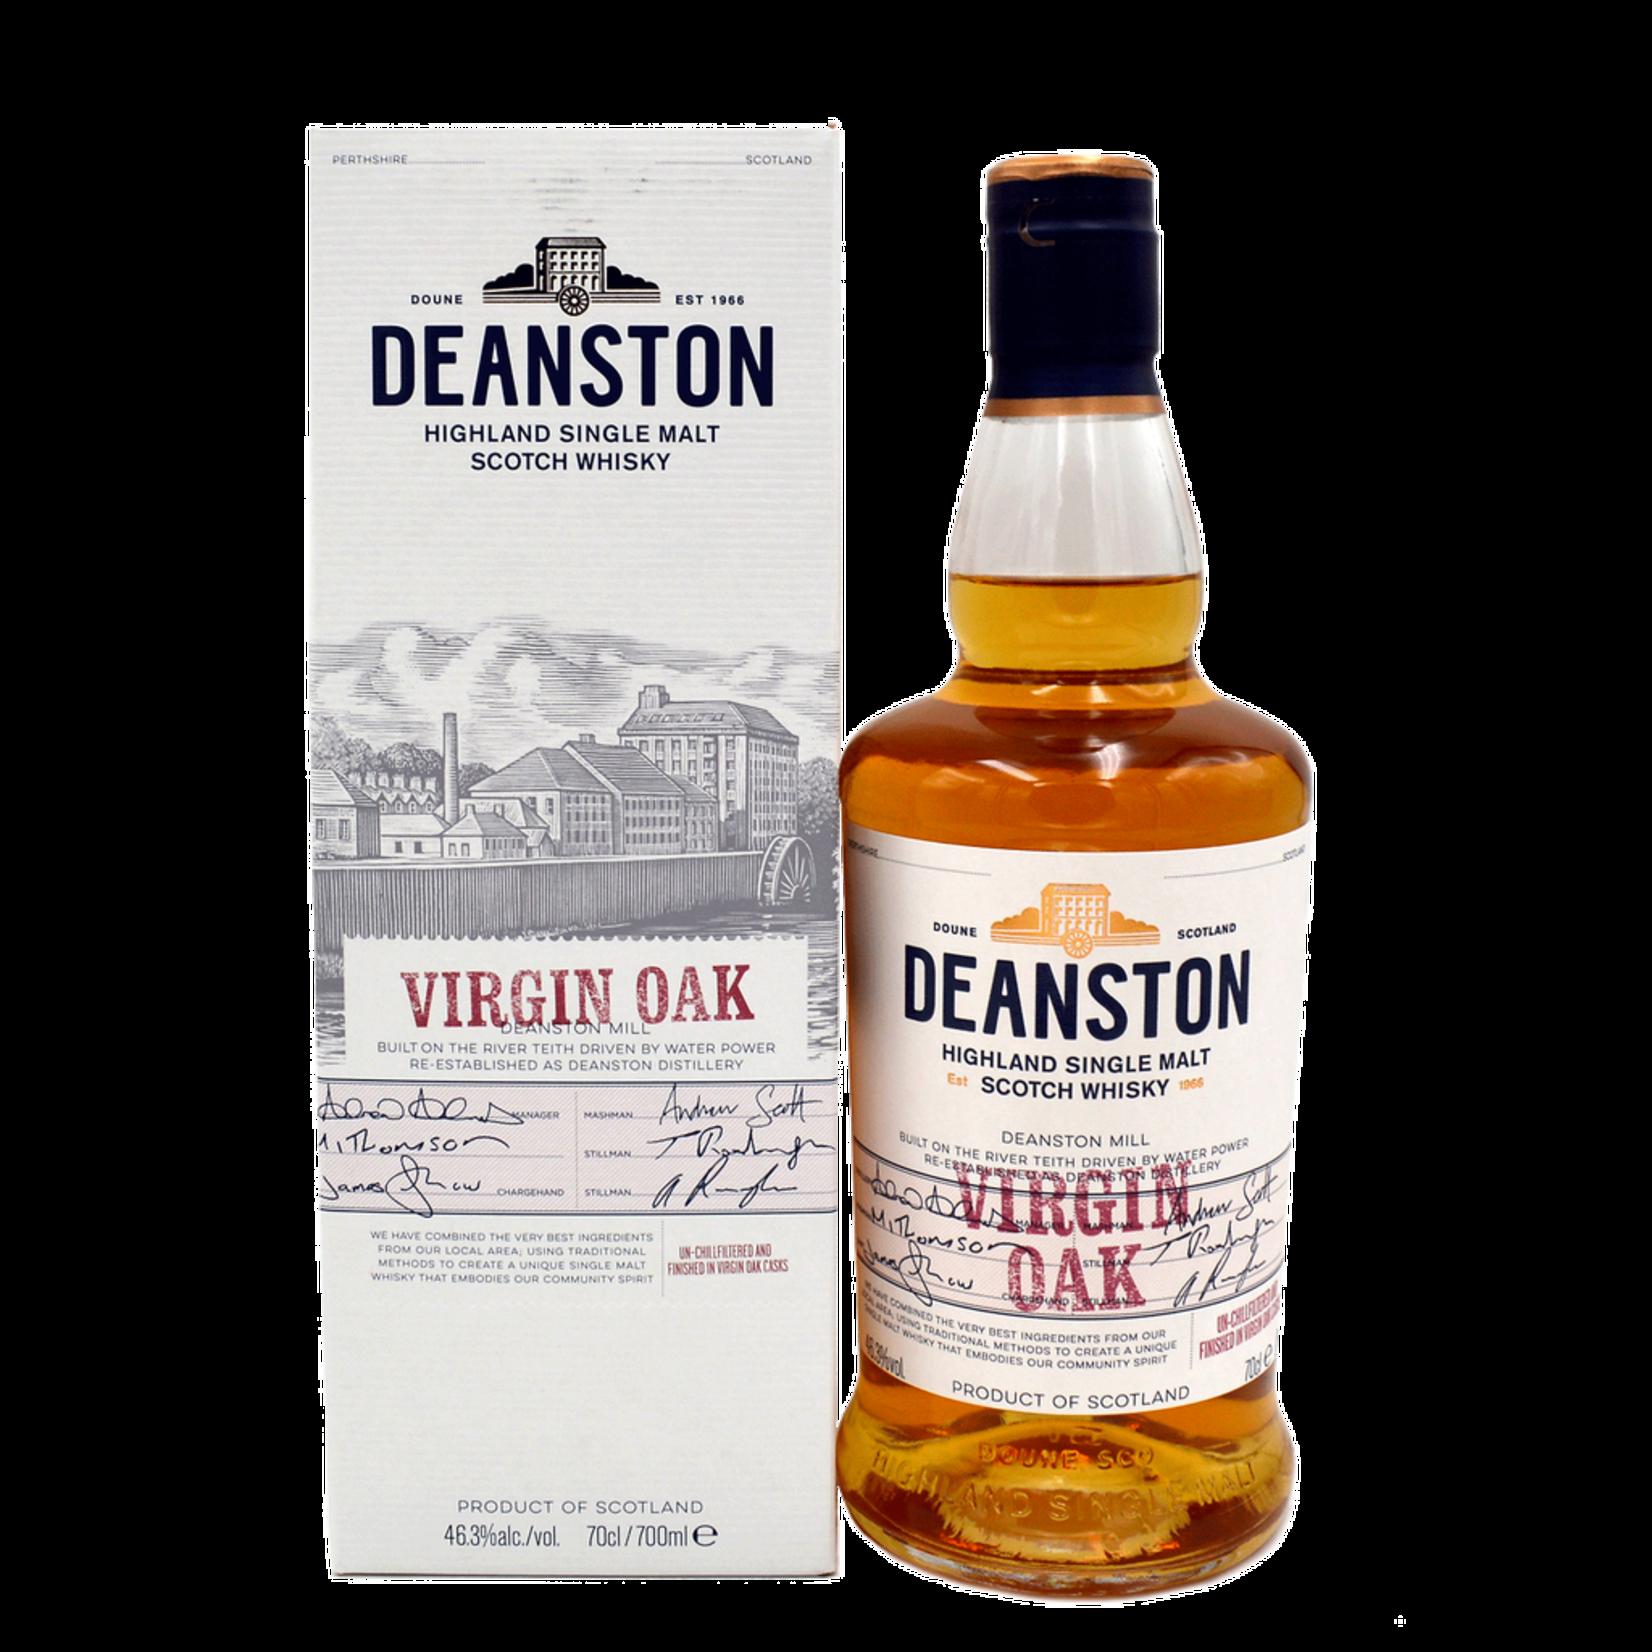 Deanston Virgin Oak Scotch